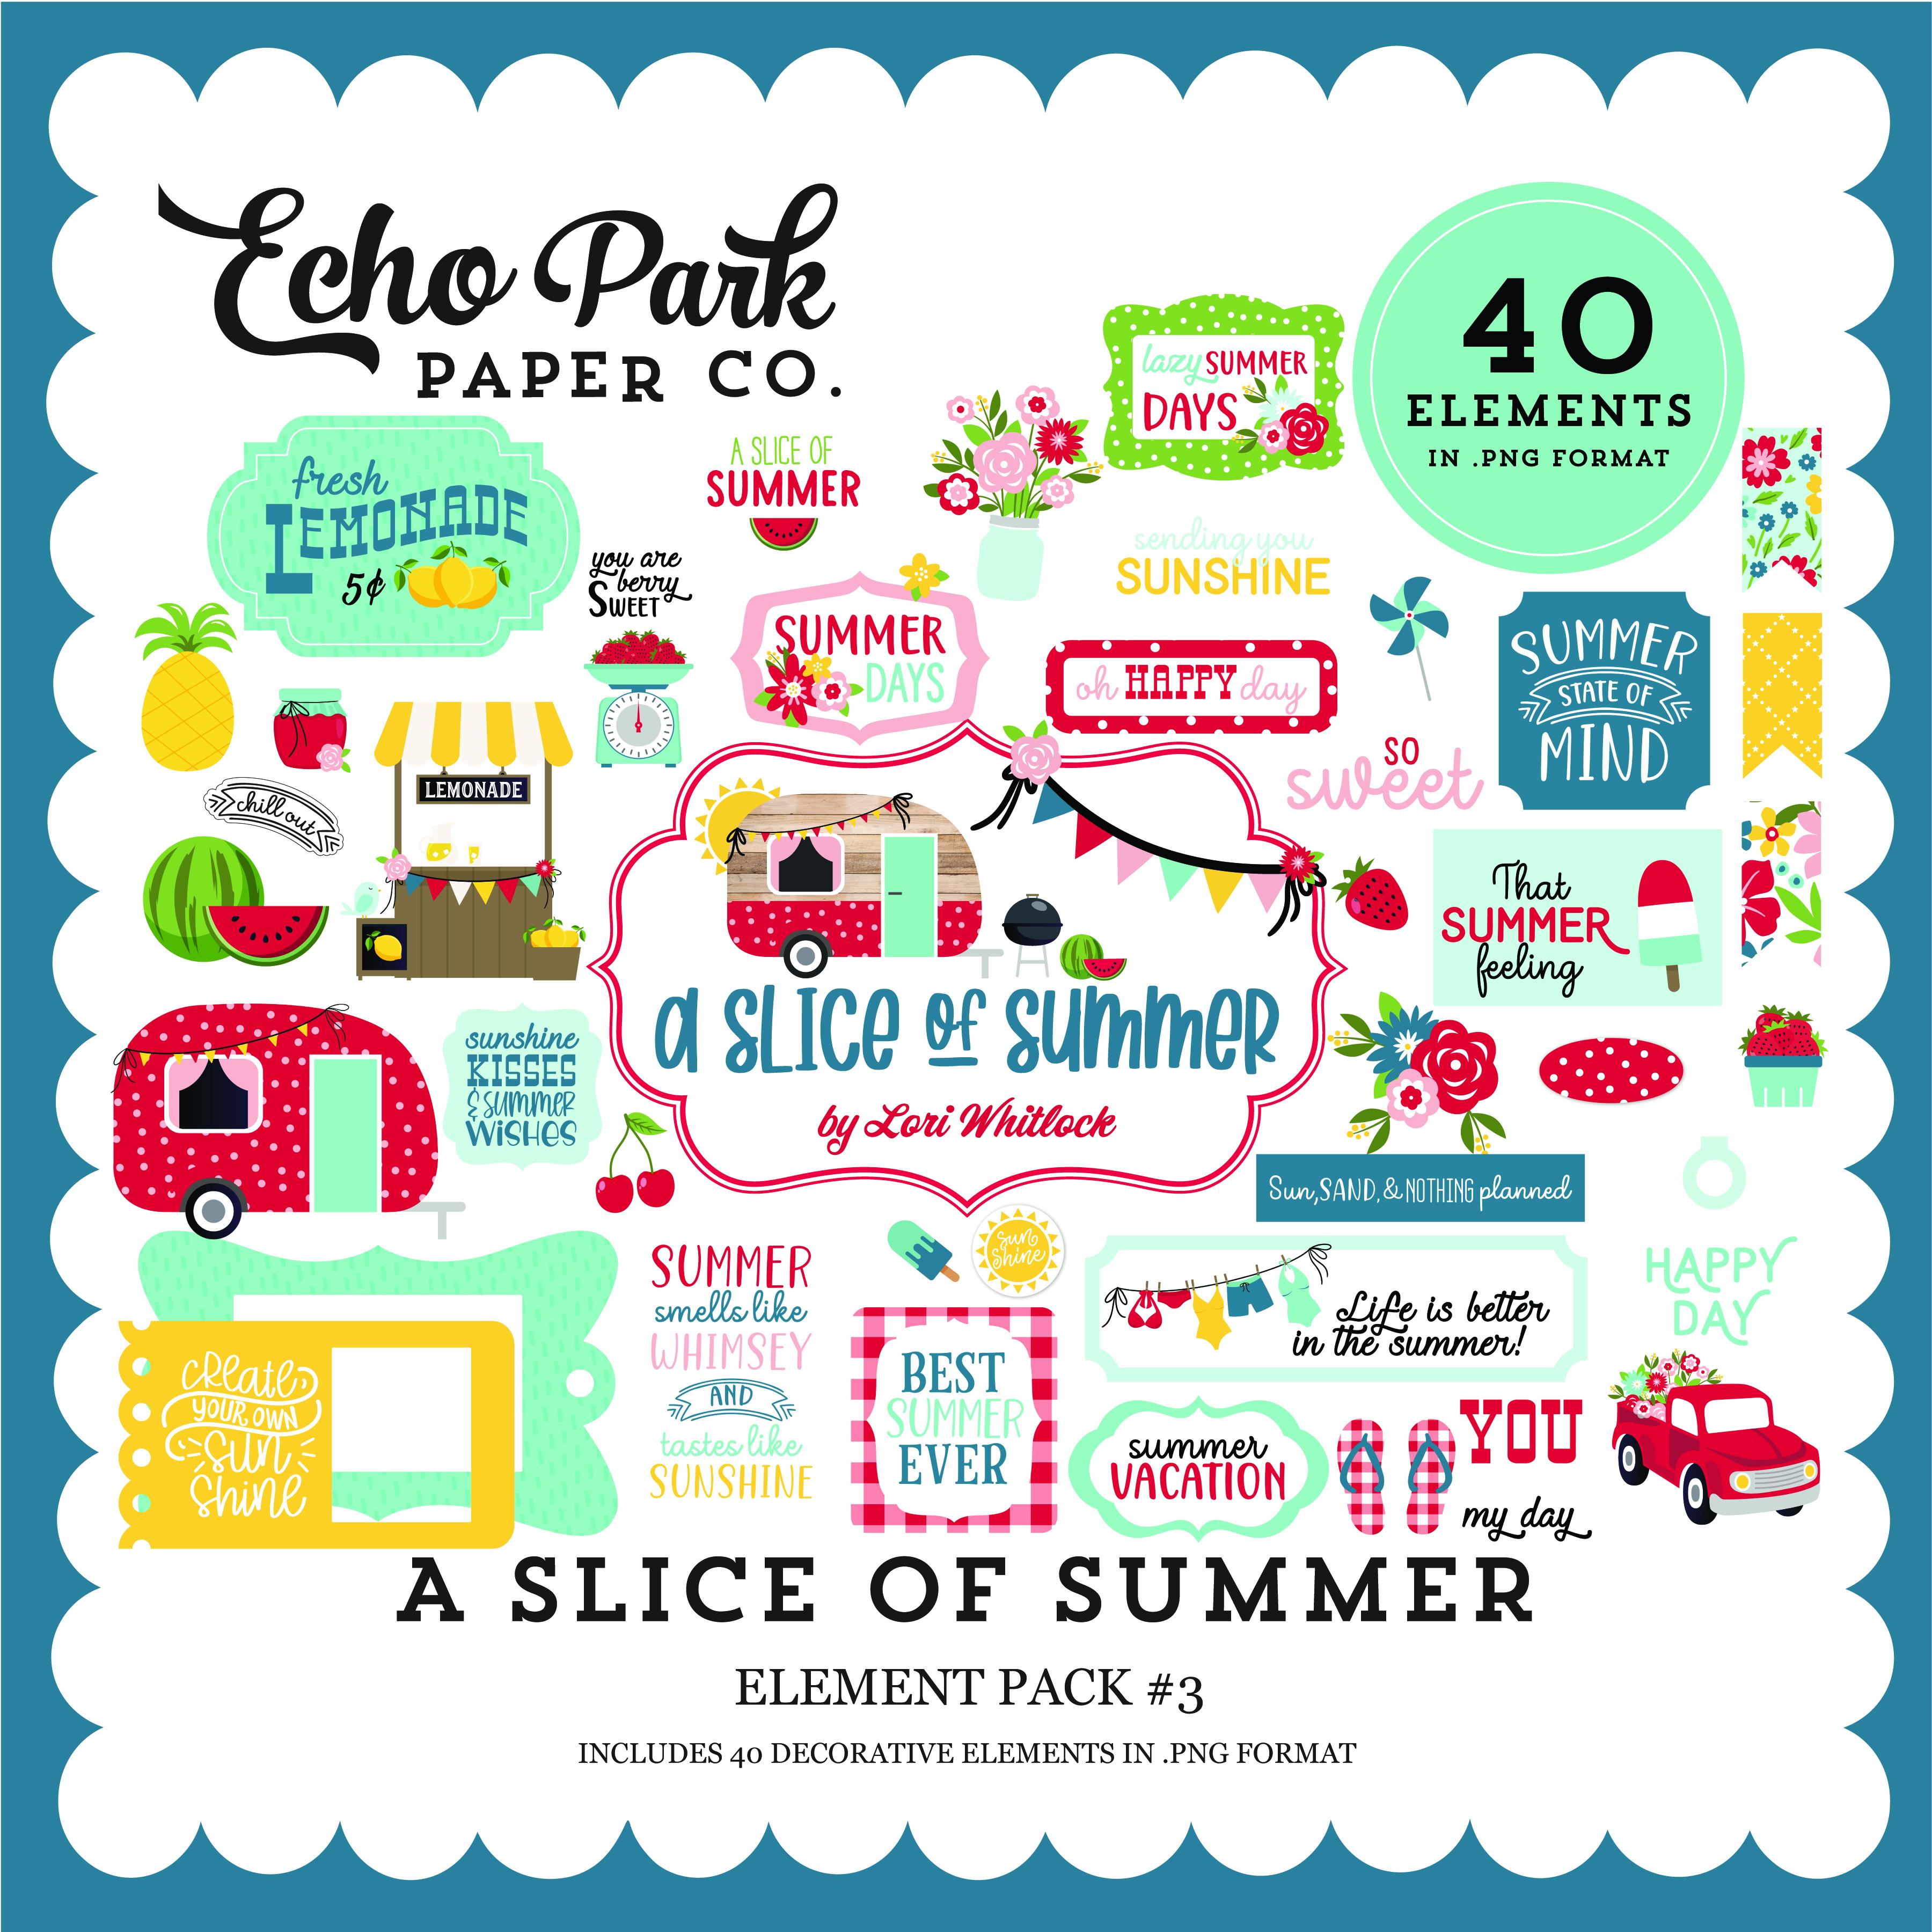 A Slice of Summer Element Pack #3